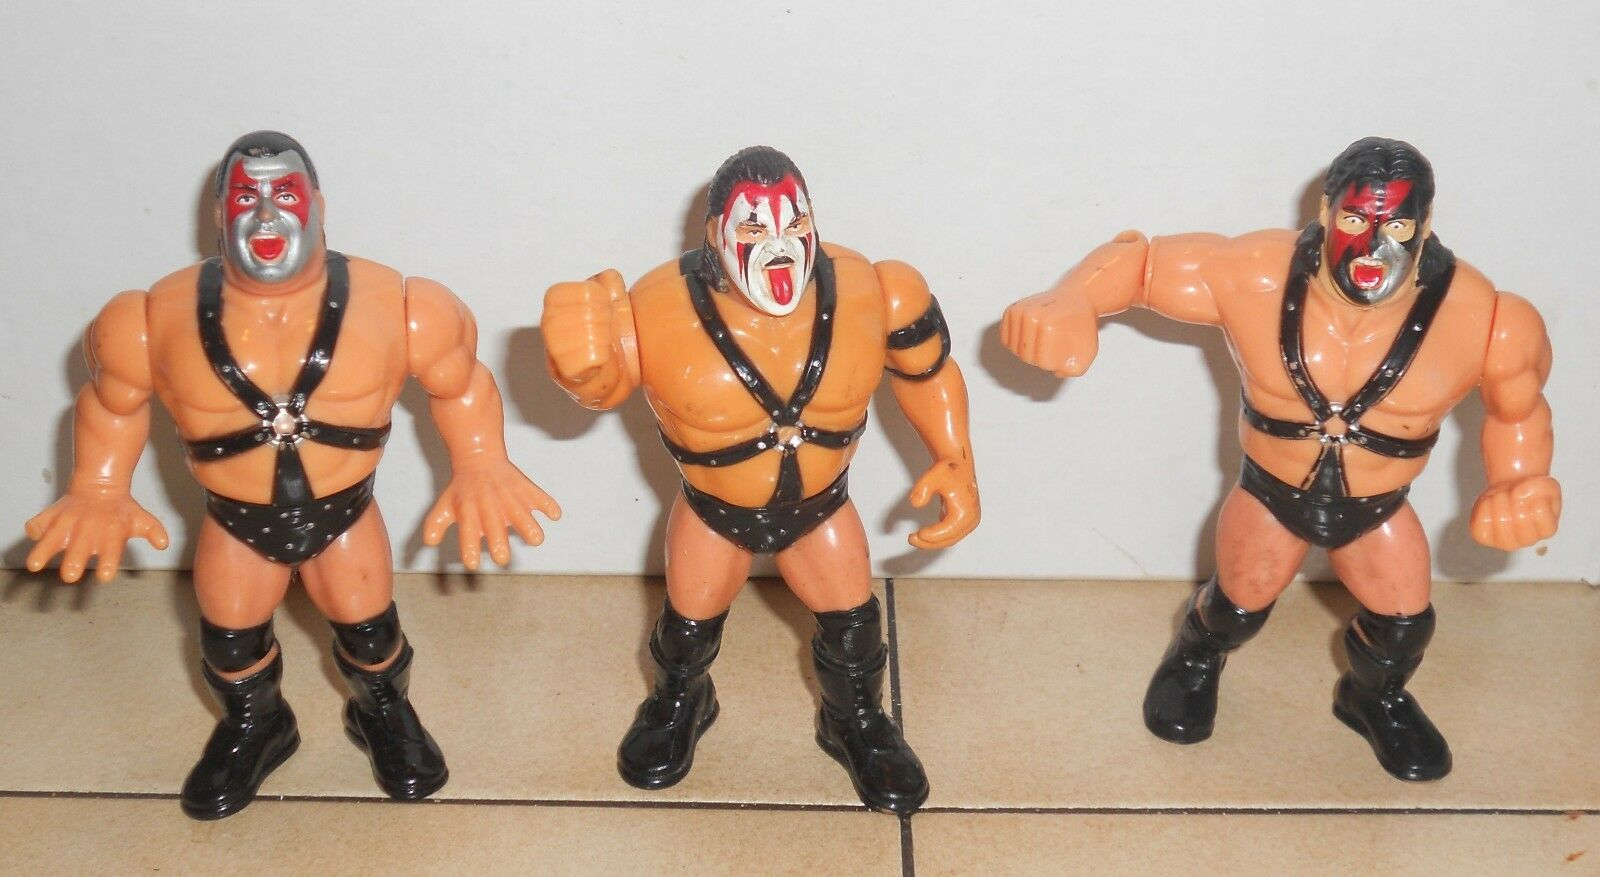 1991 Hasbro WWF Series 6 Demolition AX SMASH CRUSH Action Figures WWE WCW